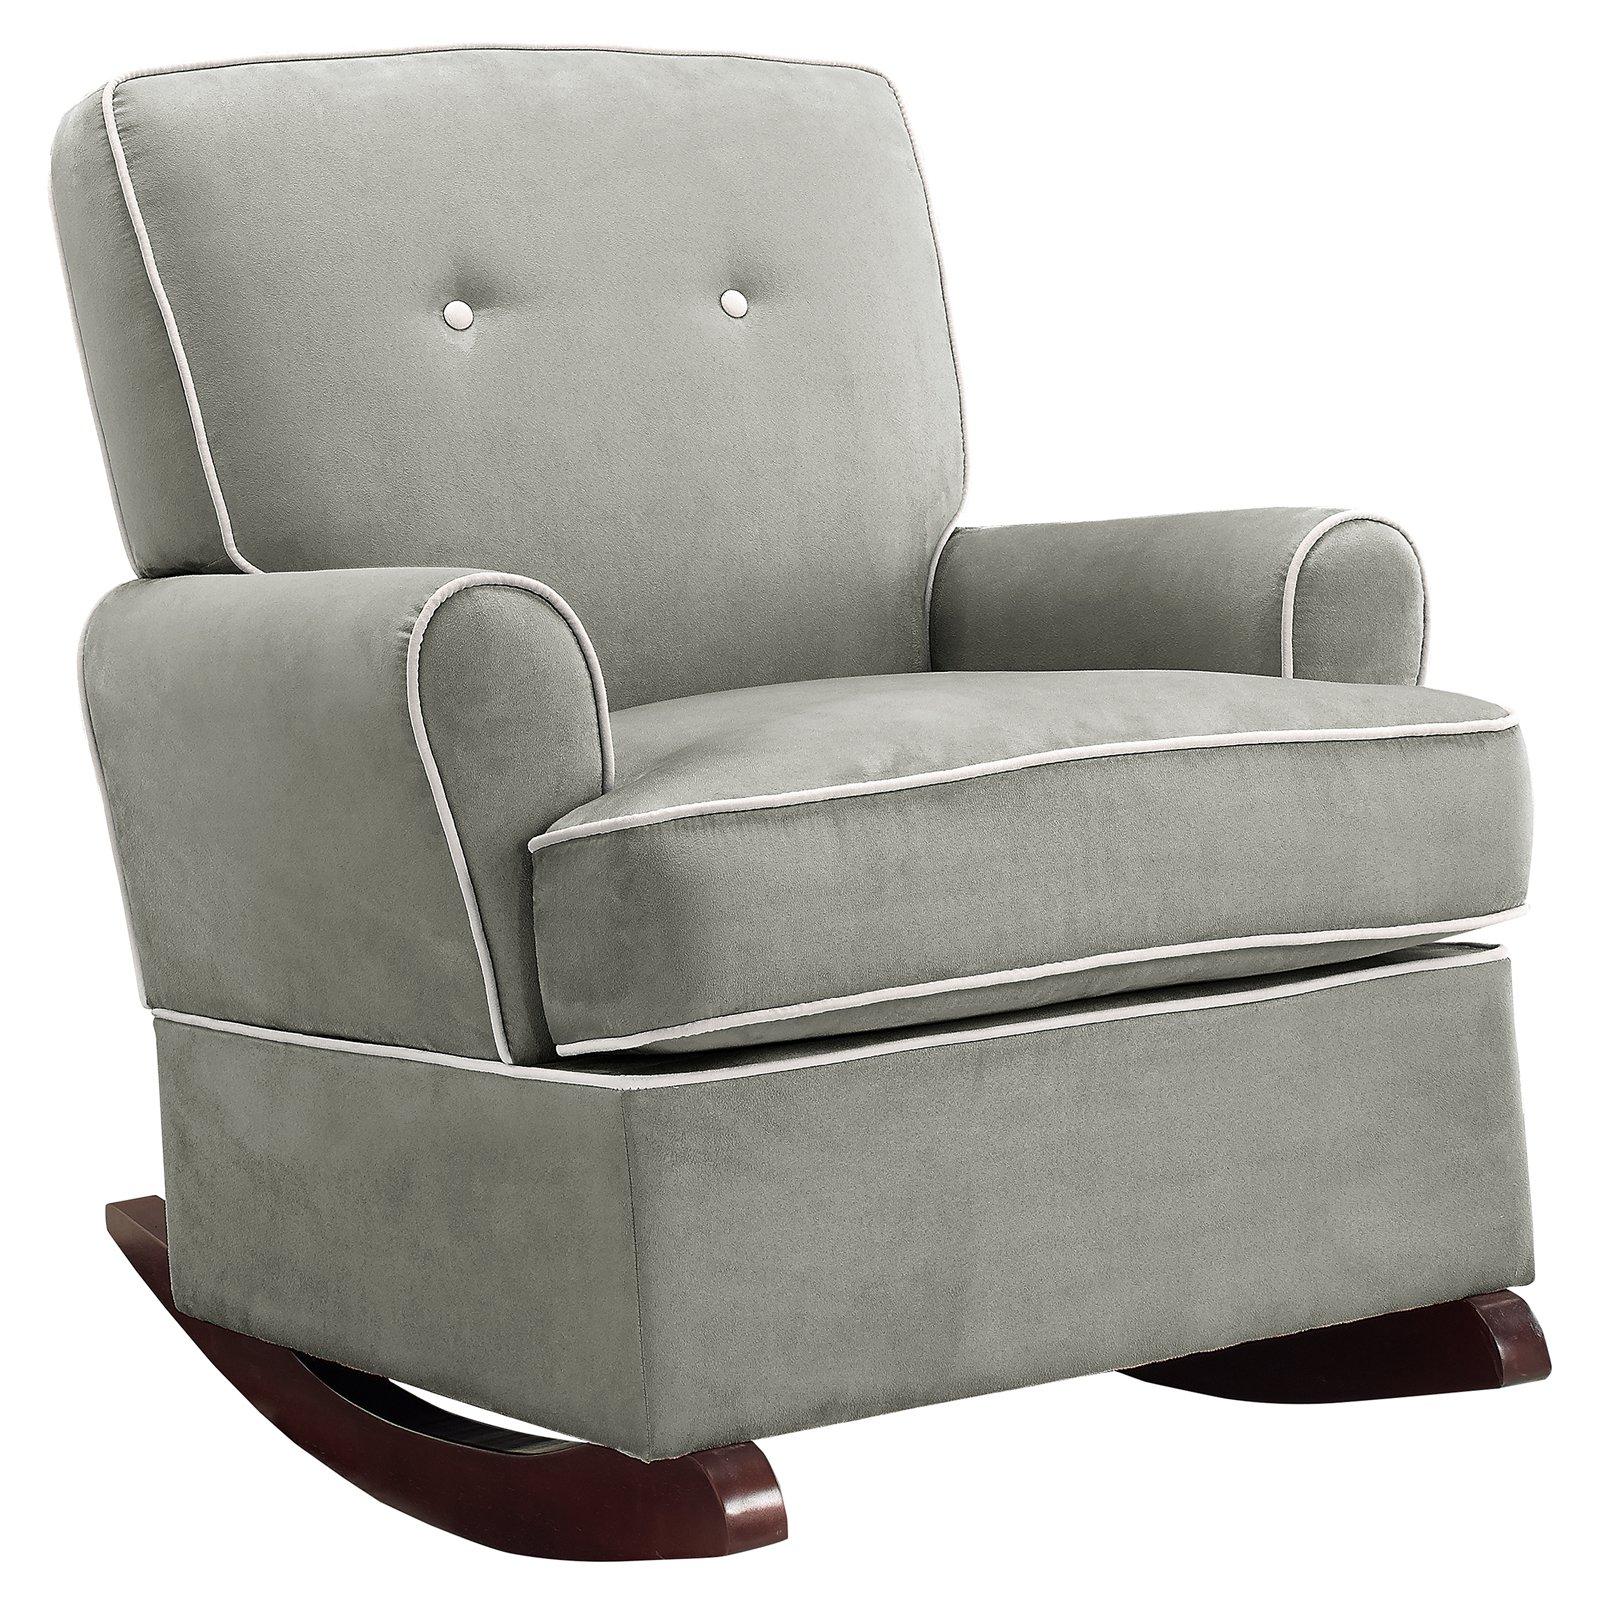 Baby Relax Tinsley Rocker Rocker Chair Nursery